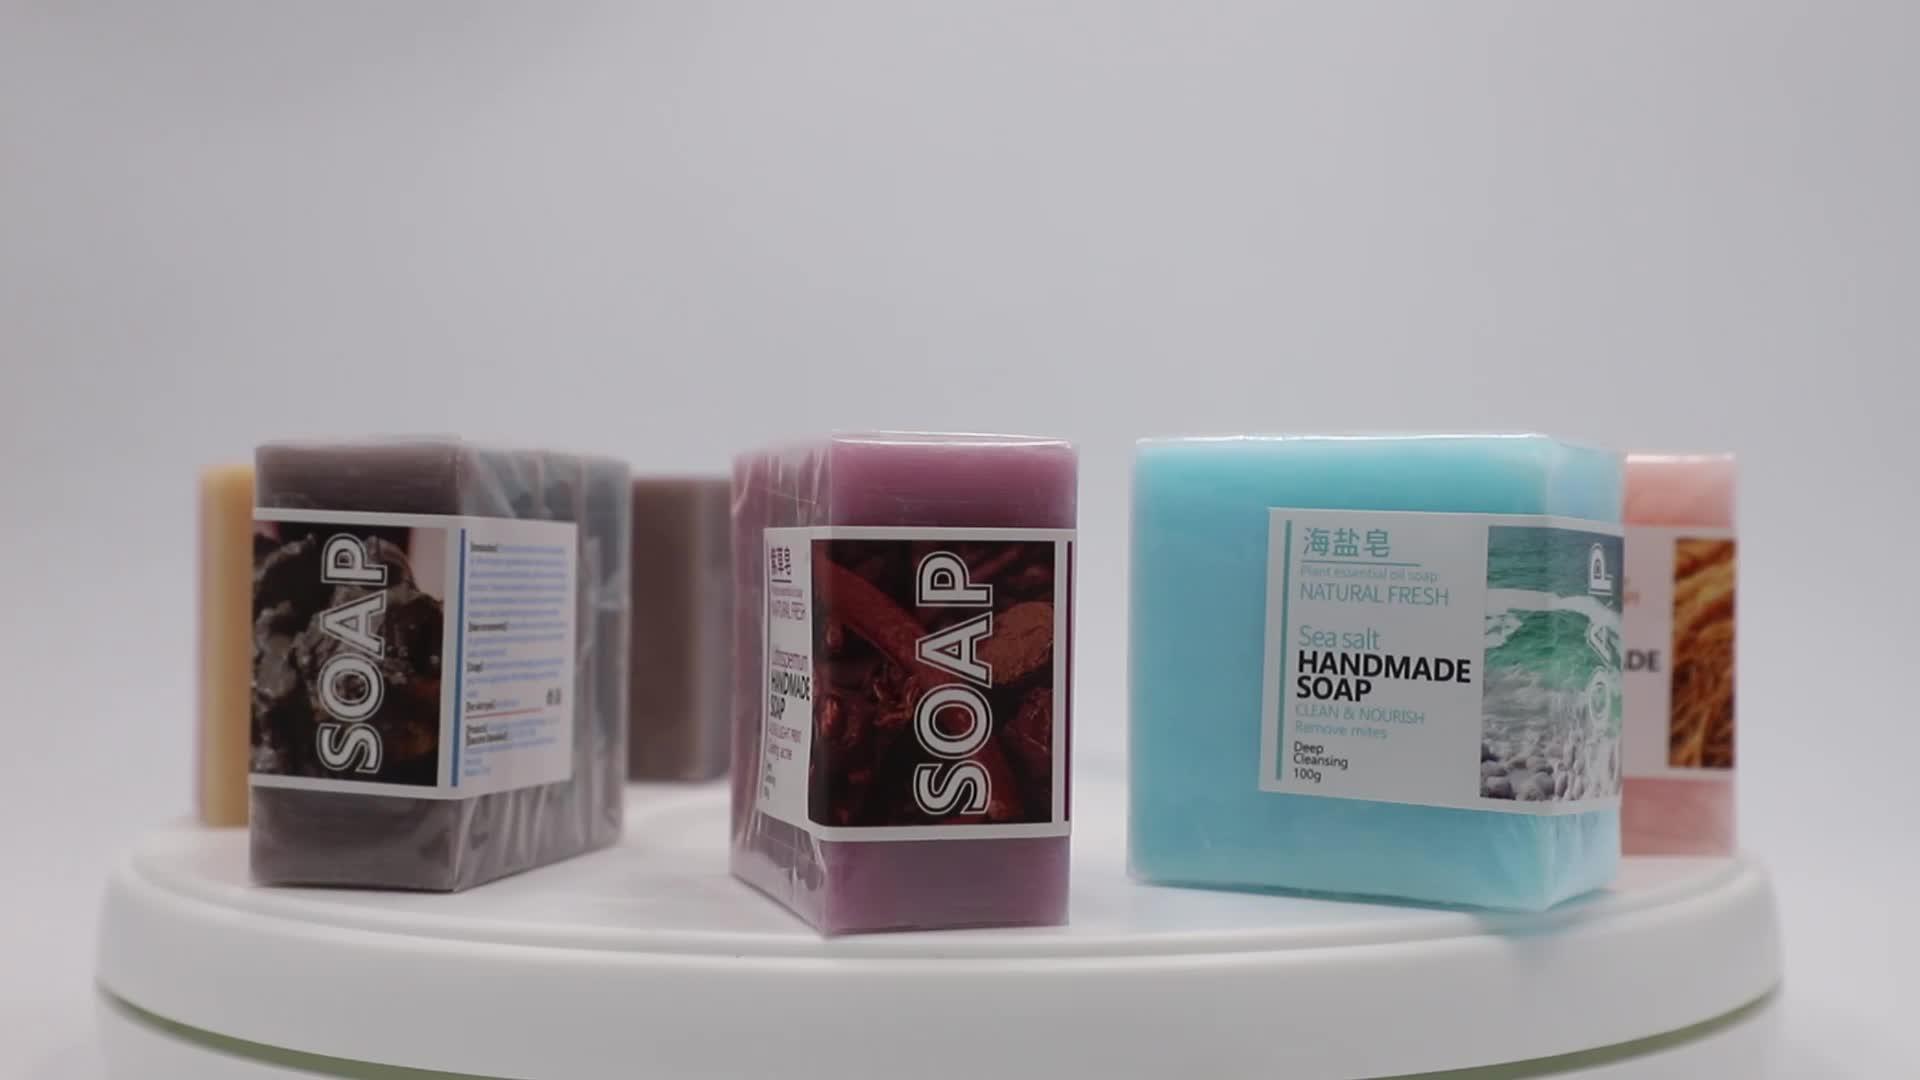 China Bath Yoni Hand Liquid Kojic Acid Baby Organic Castile Rice Milk Lemon Hemp Foaming Soap